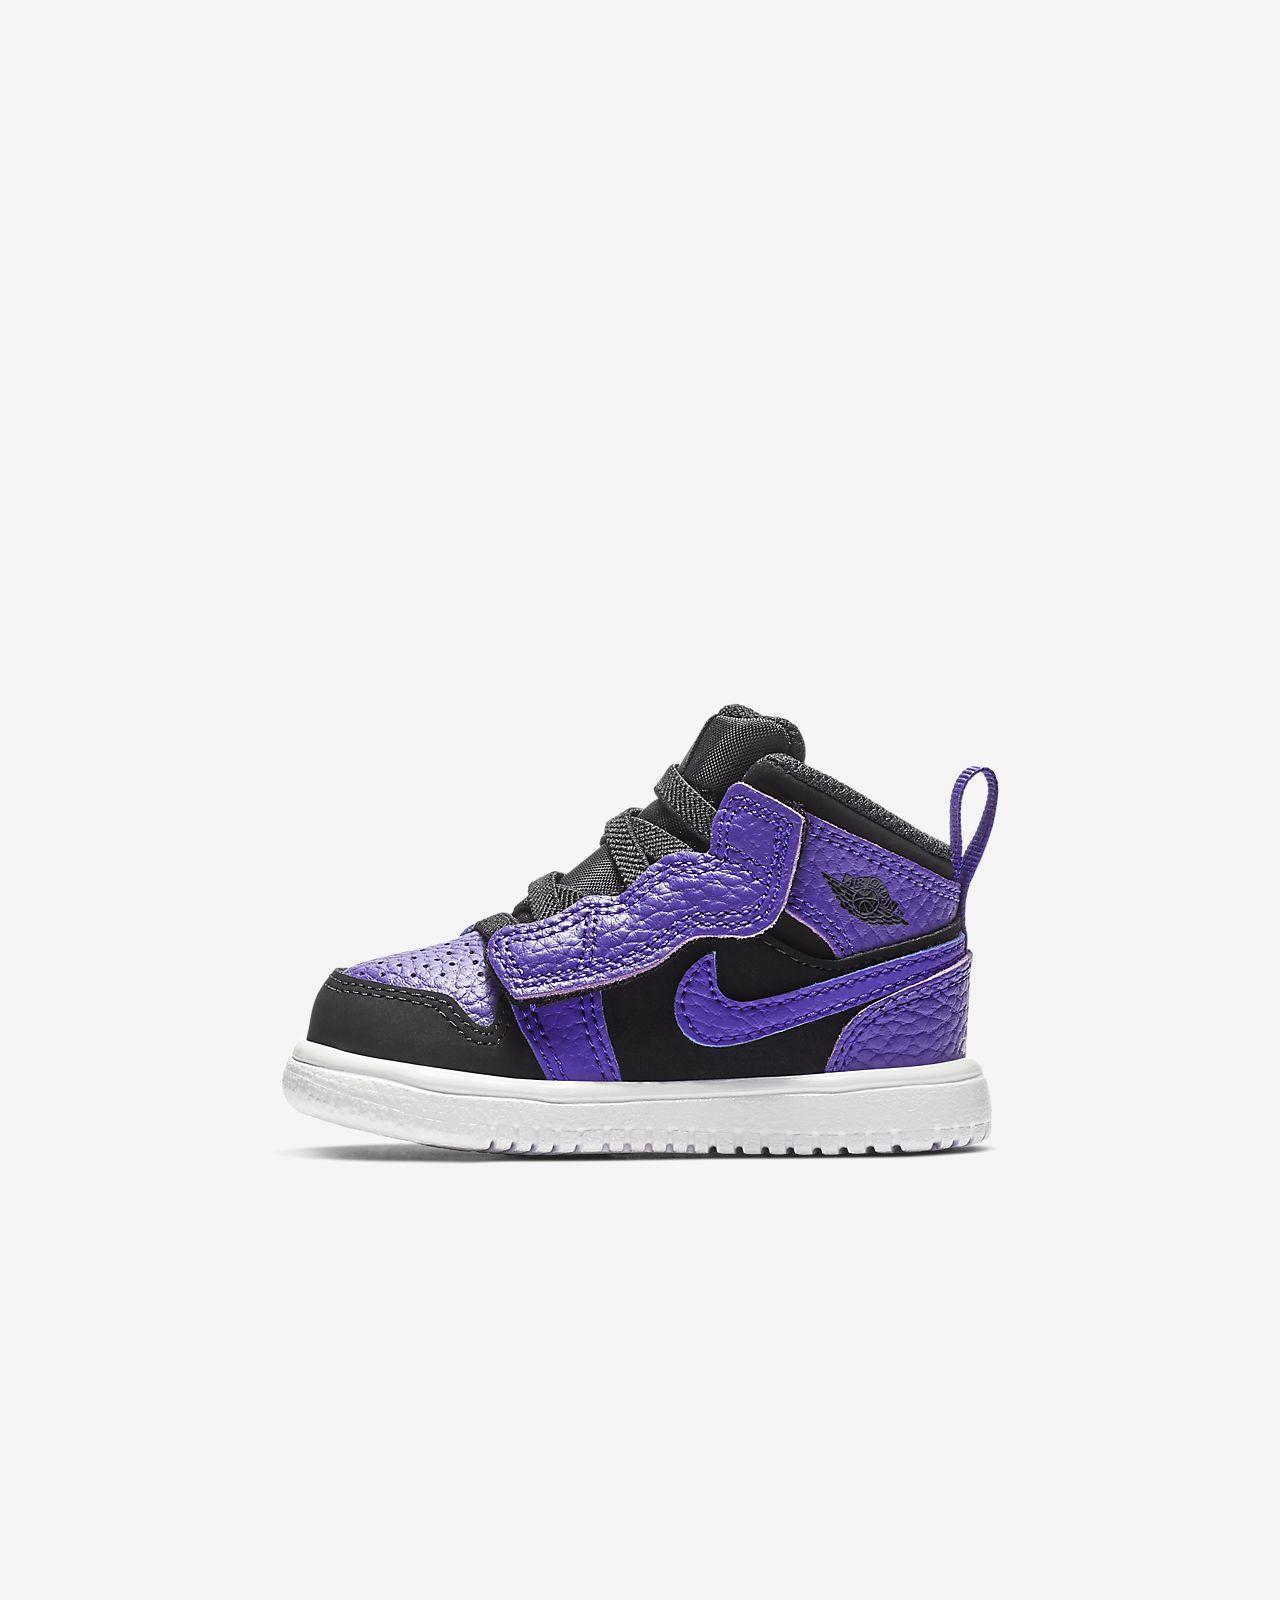 purchase cheap 515a6 47e7f Baby  amp  Toddler Shoe. Air Jordan 1 Mid